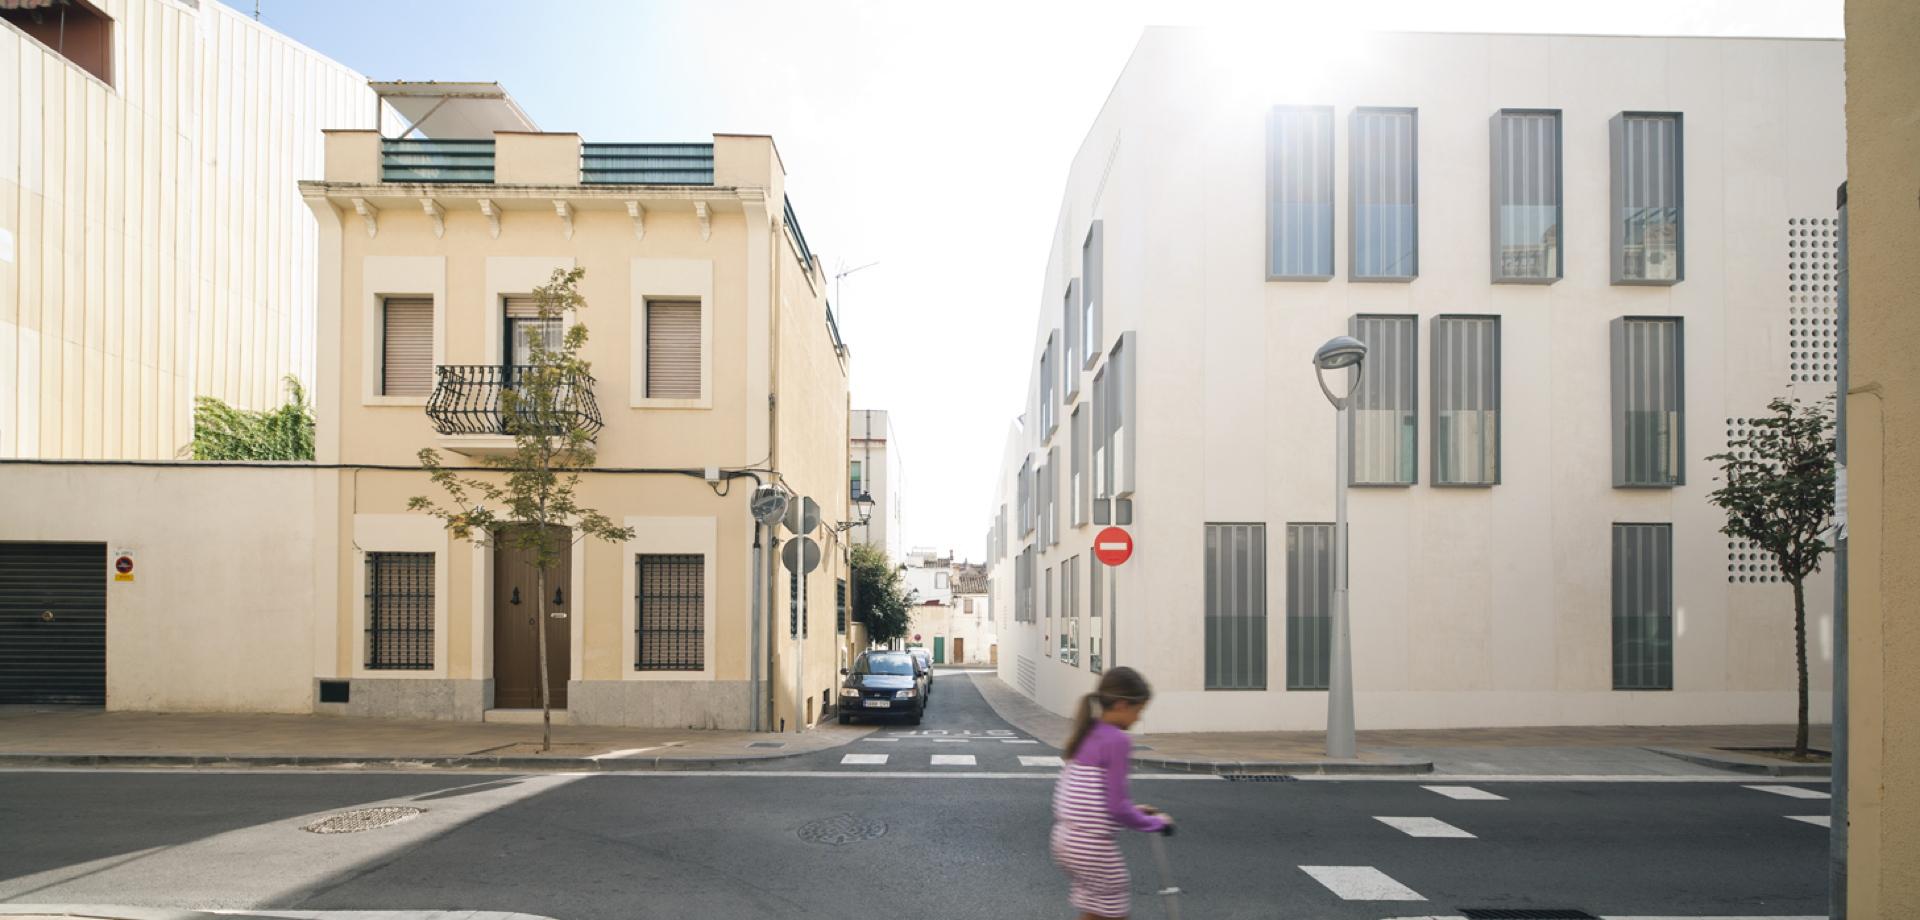 Batlle i Roig: Can Bisa centro culturale e nuove residenze